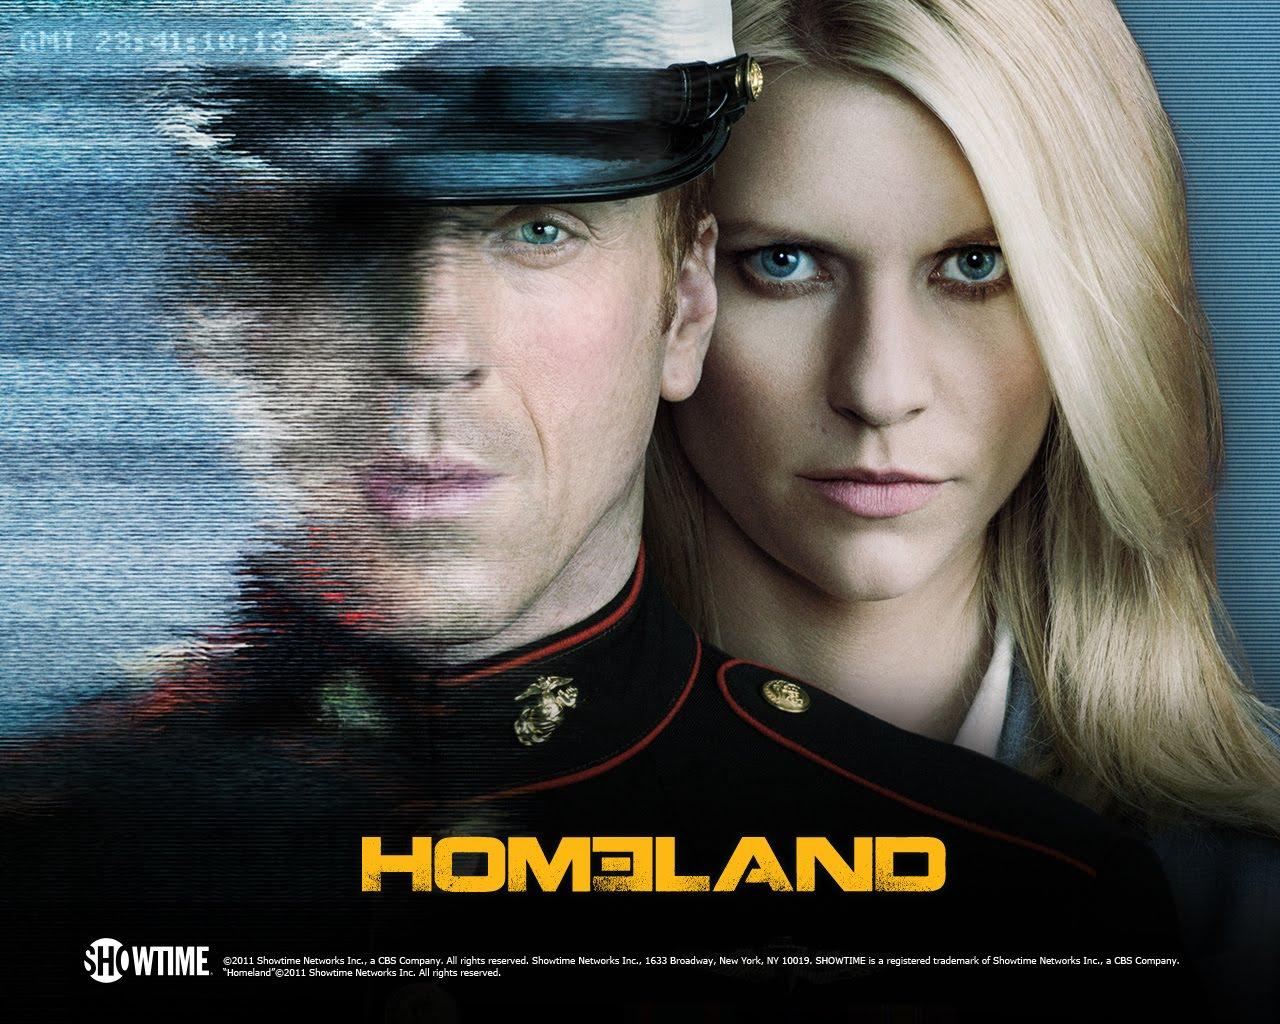 homeland - photo #25